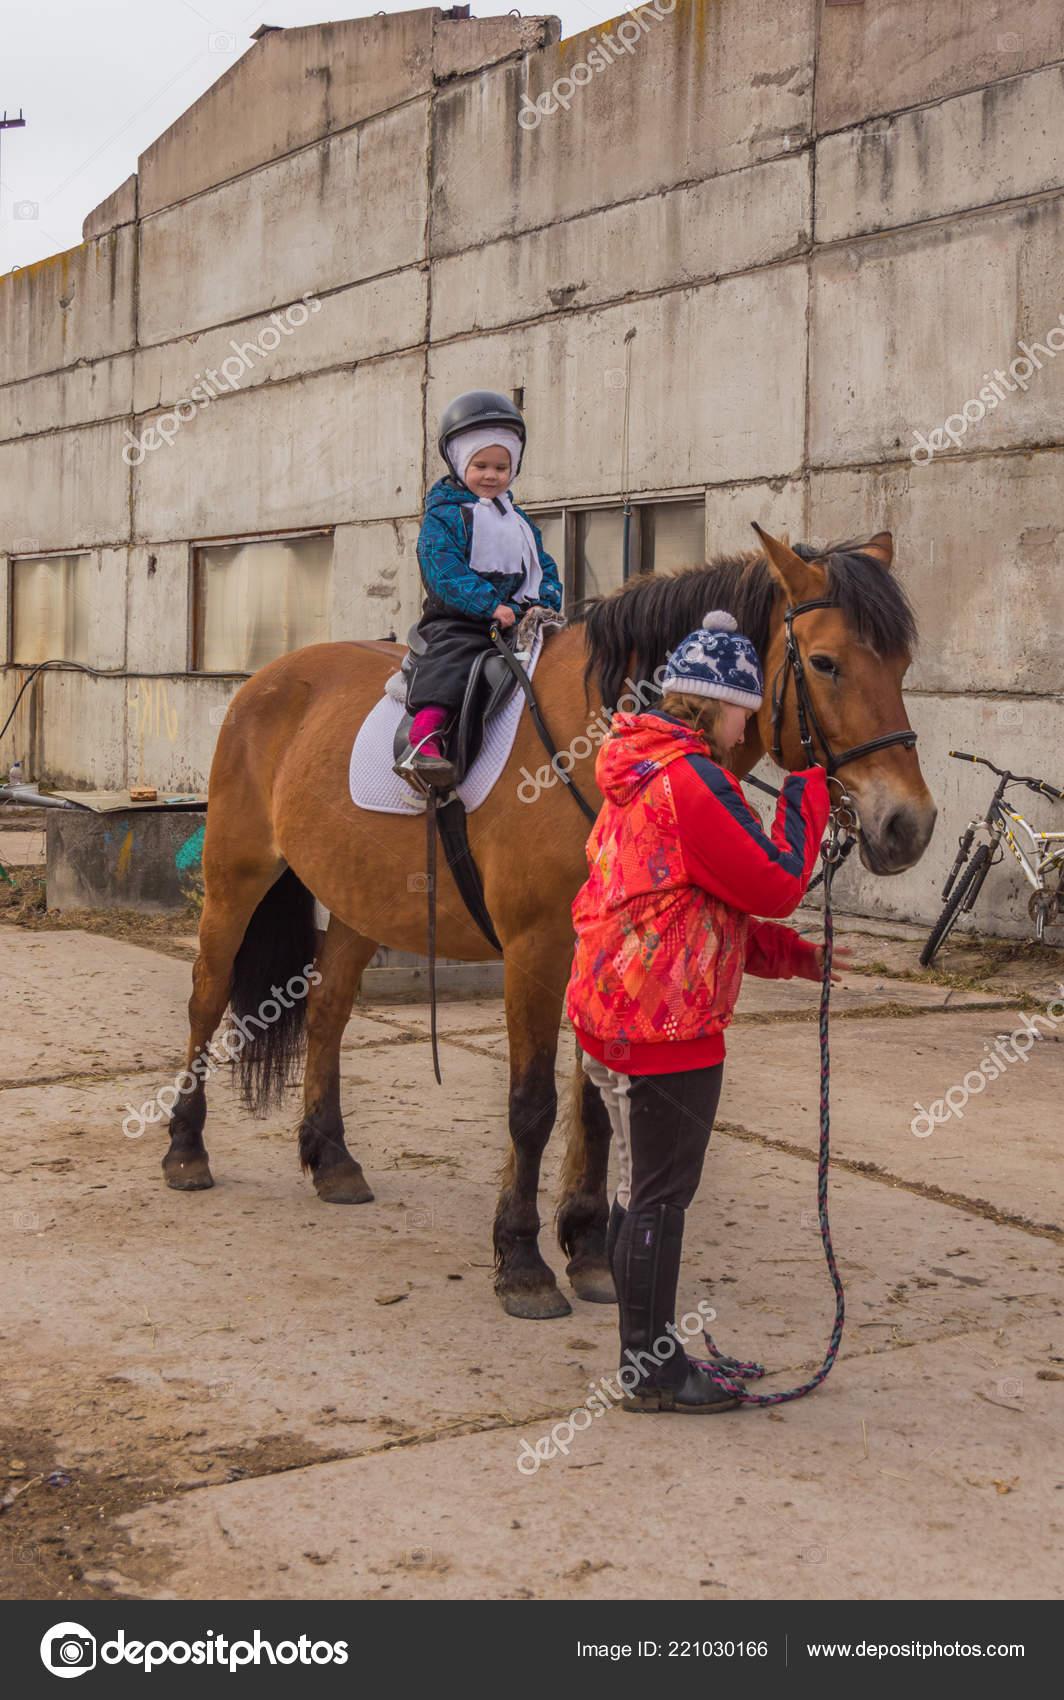 Russia Leningrad Region Nikolskoye March 2017 Stable Horse Riding Girls Stock Editorial Photo C P Kdmitry 221030166